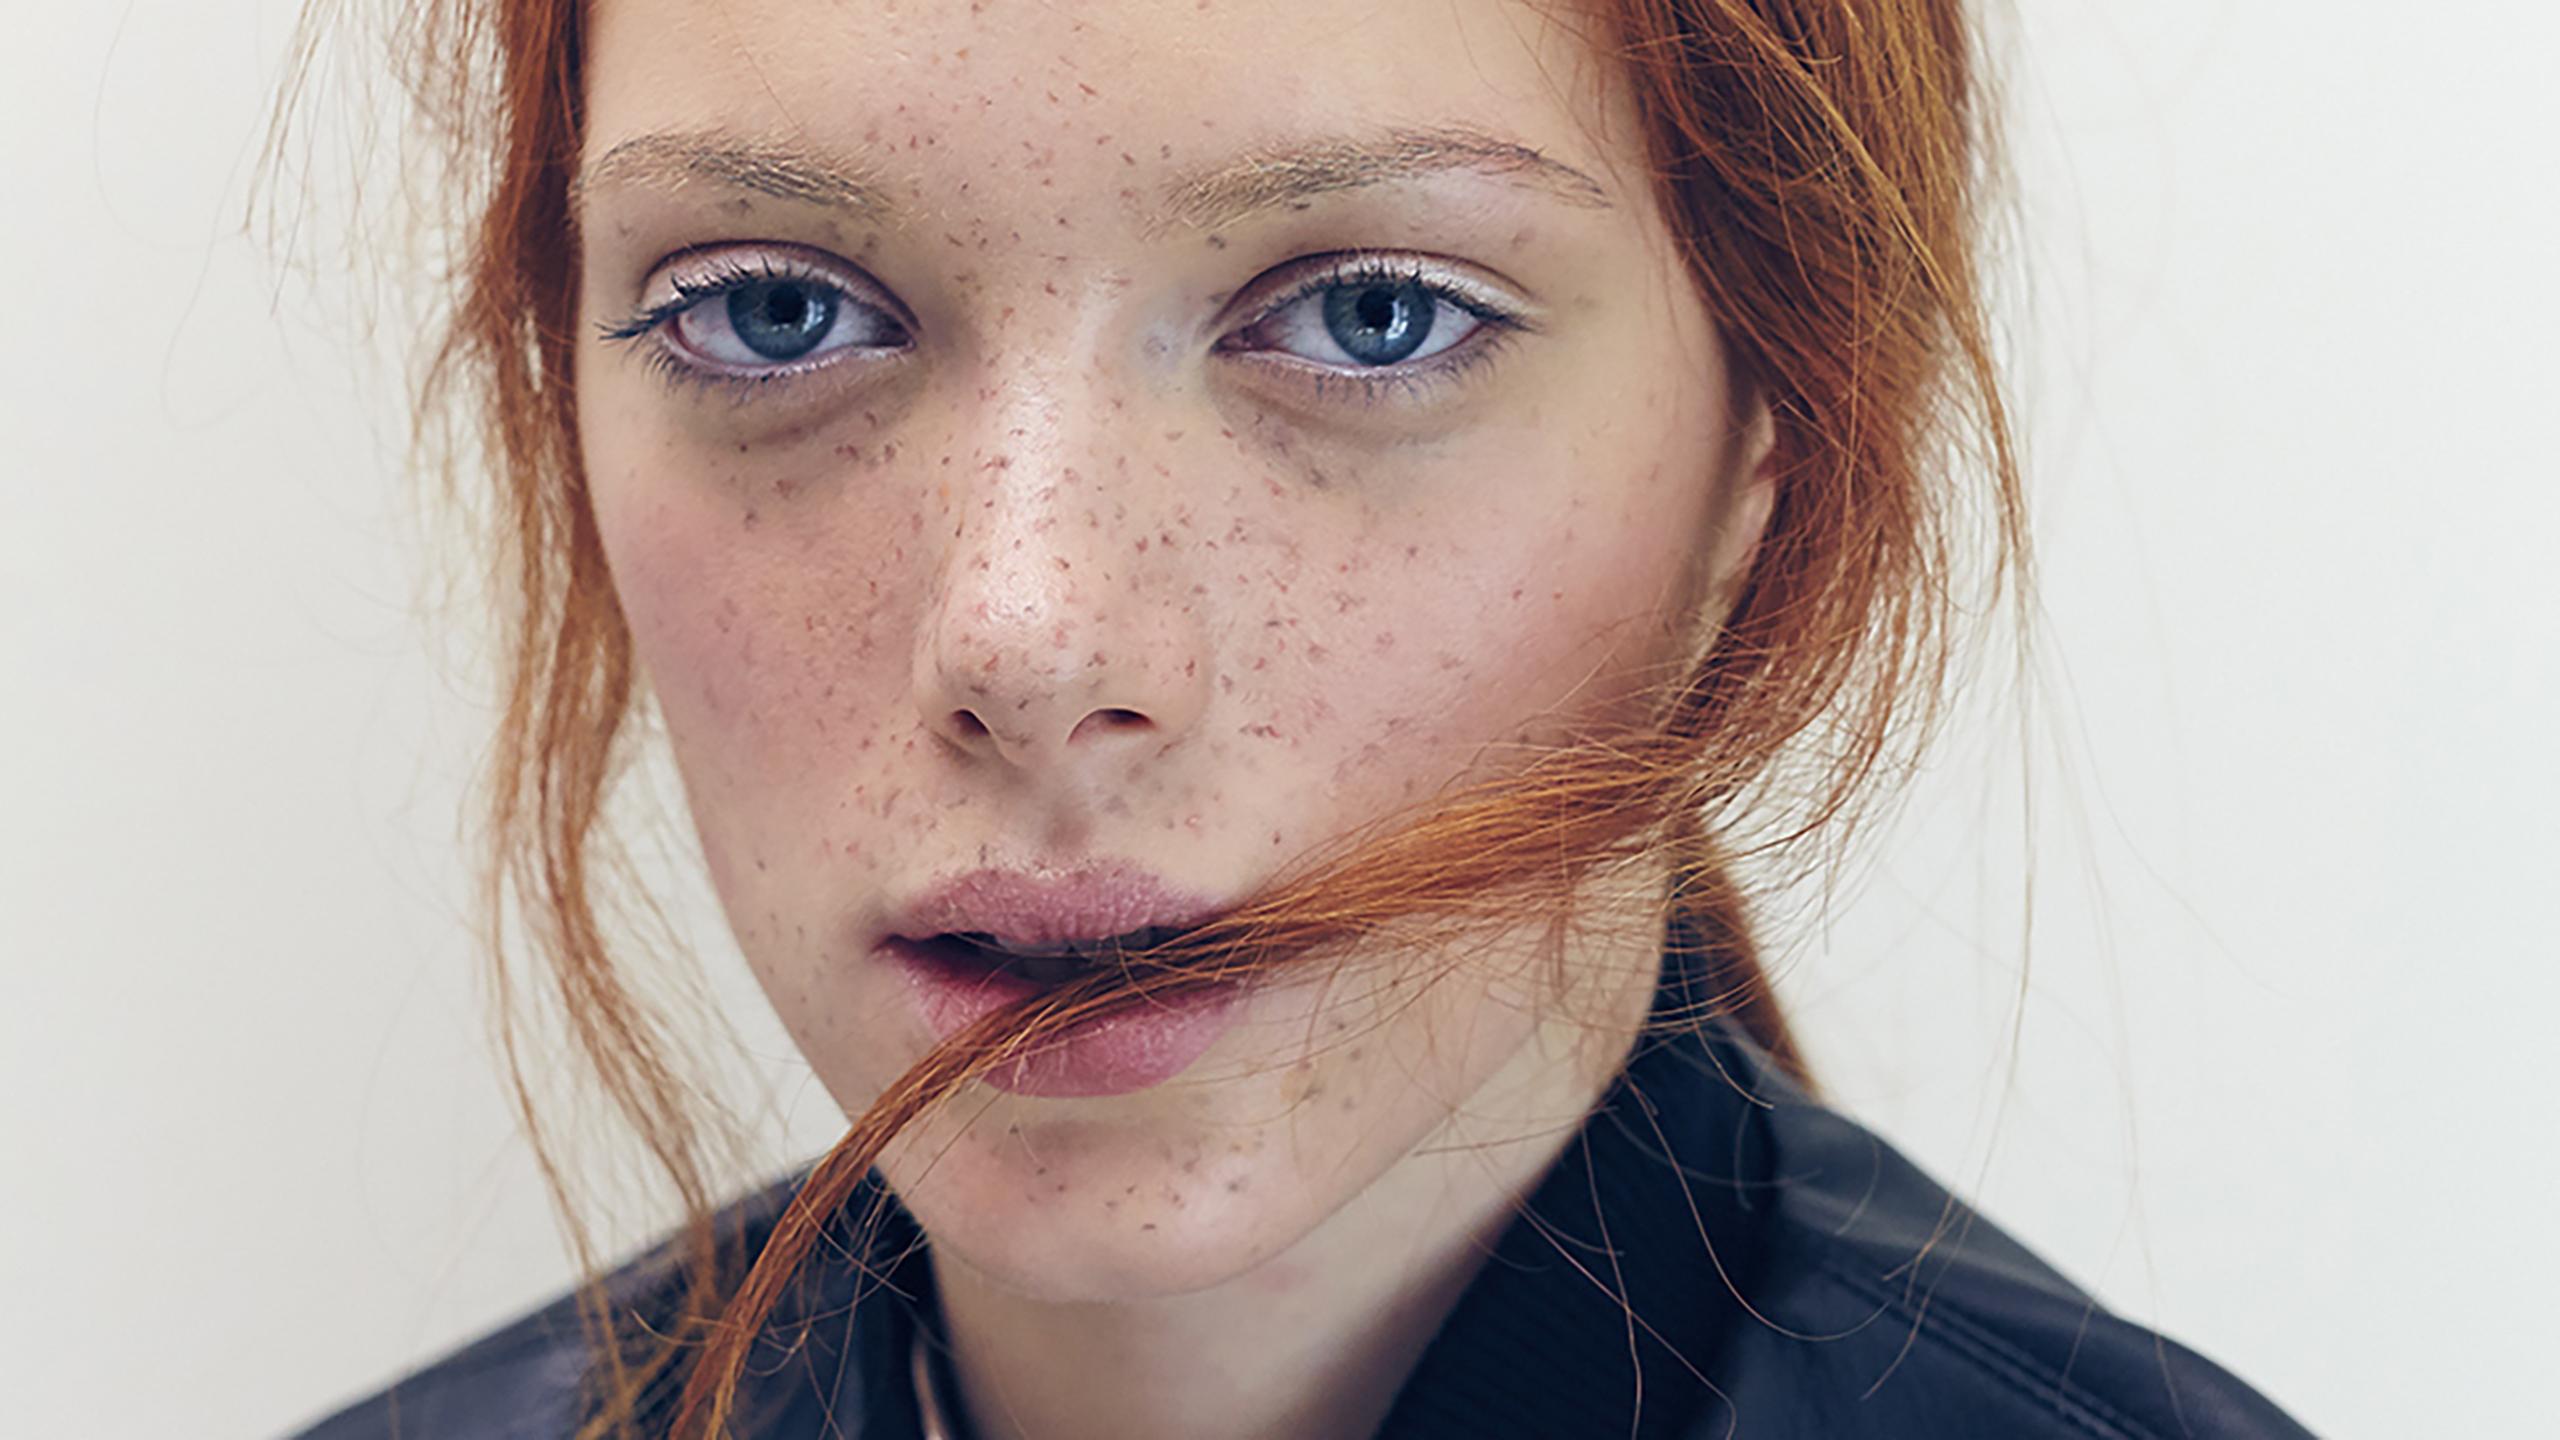 Bareface Agency | Dubai Model + Talent Agency | Entertainers